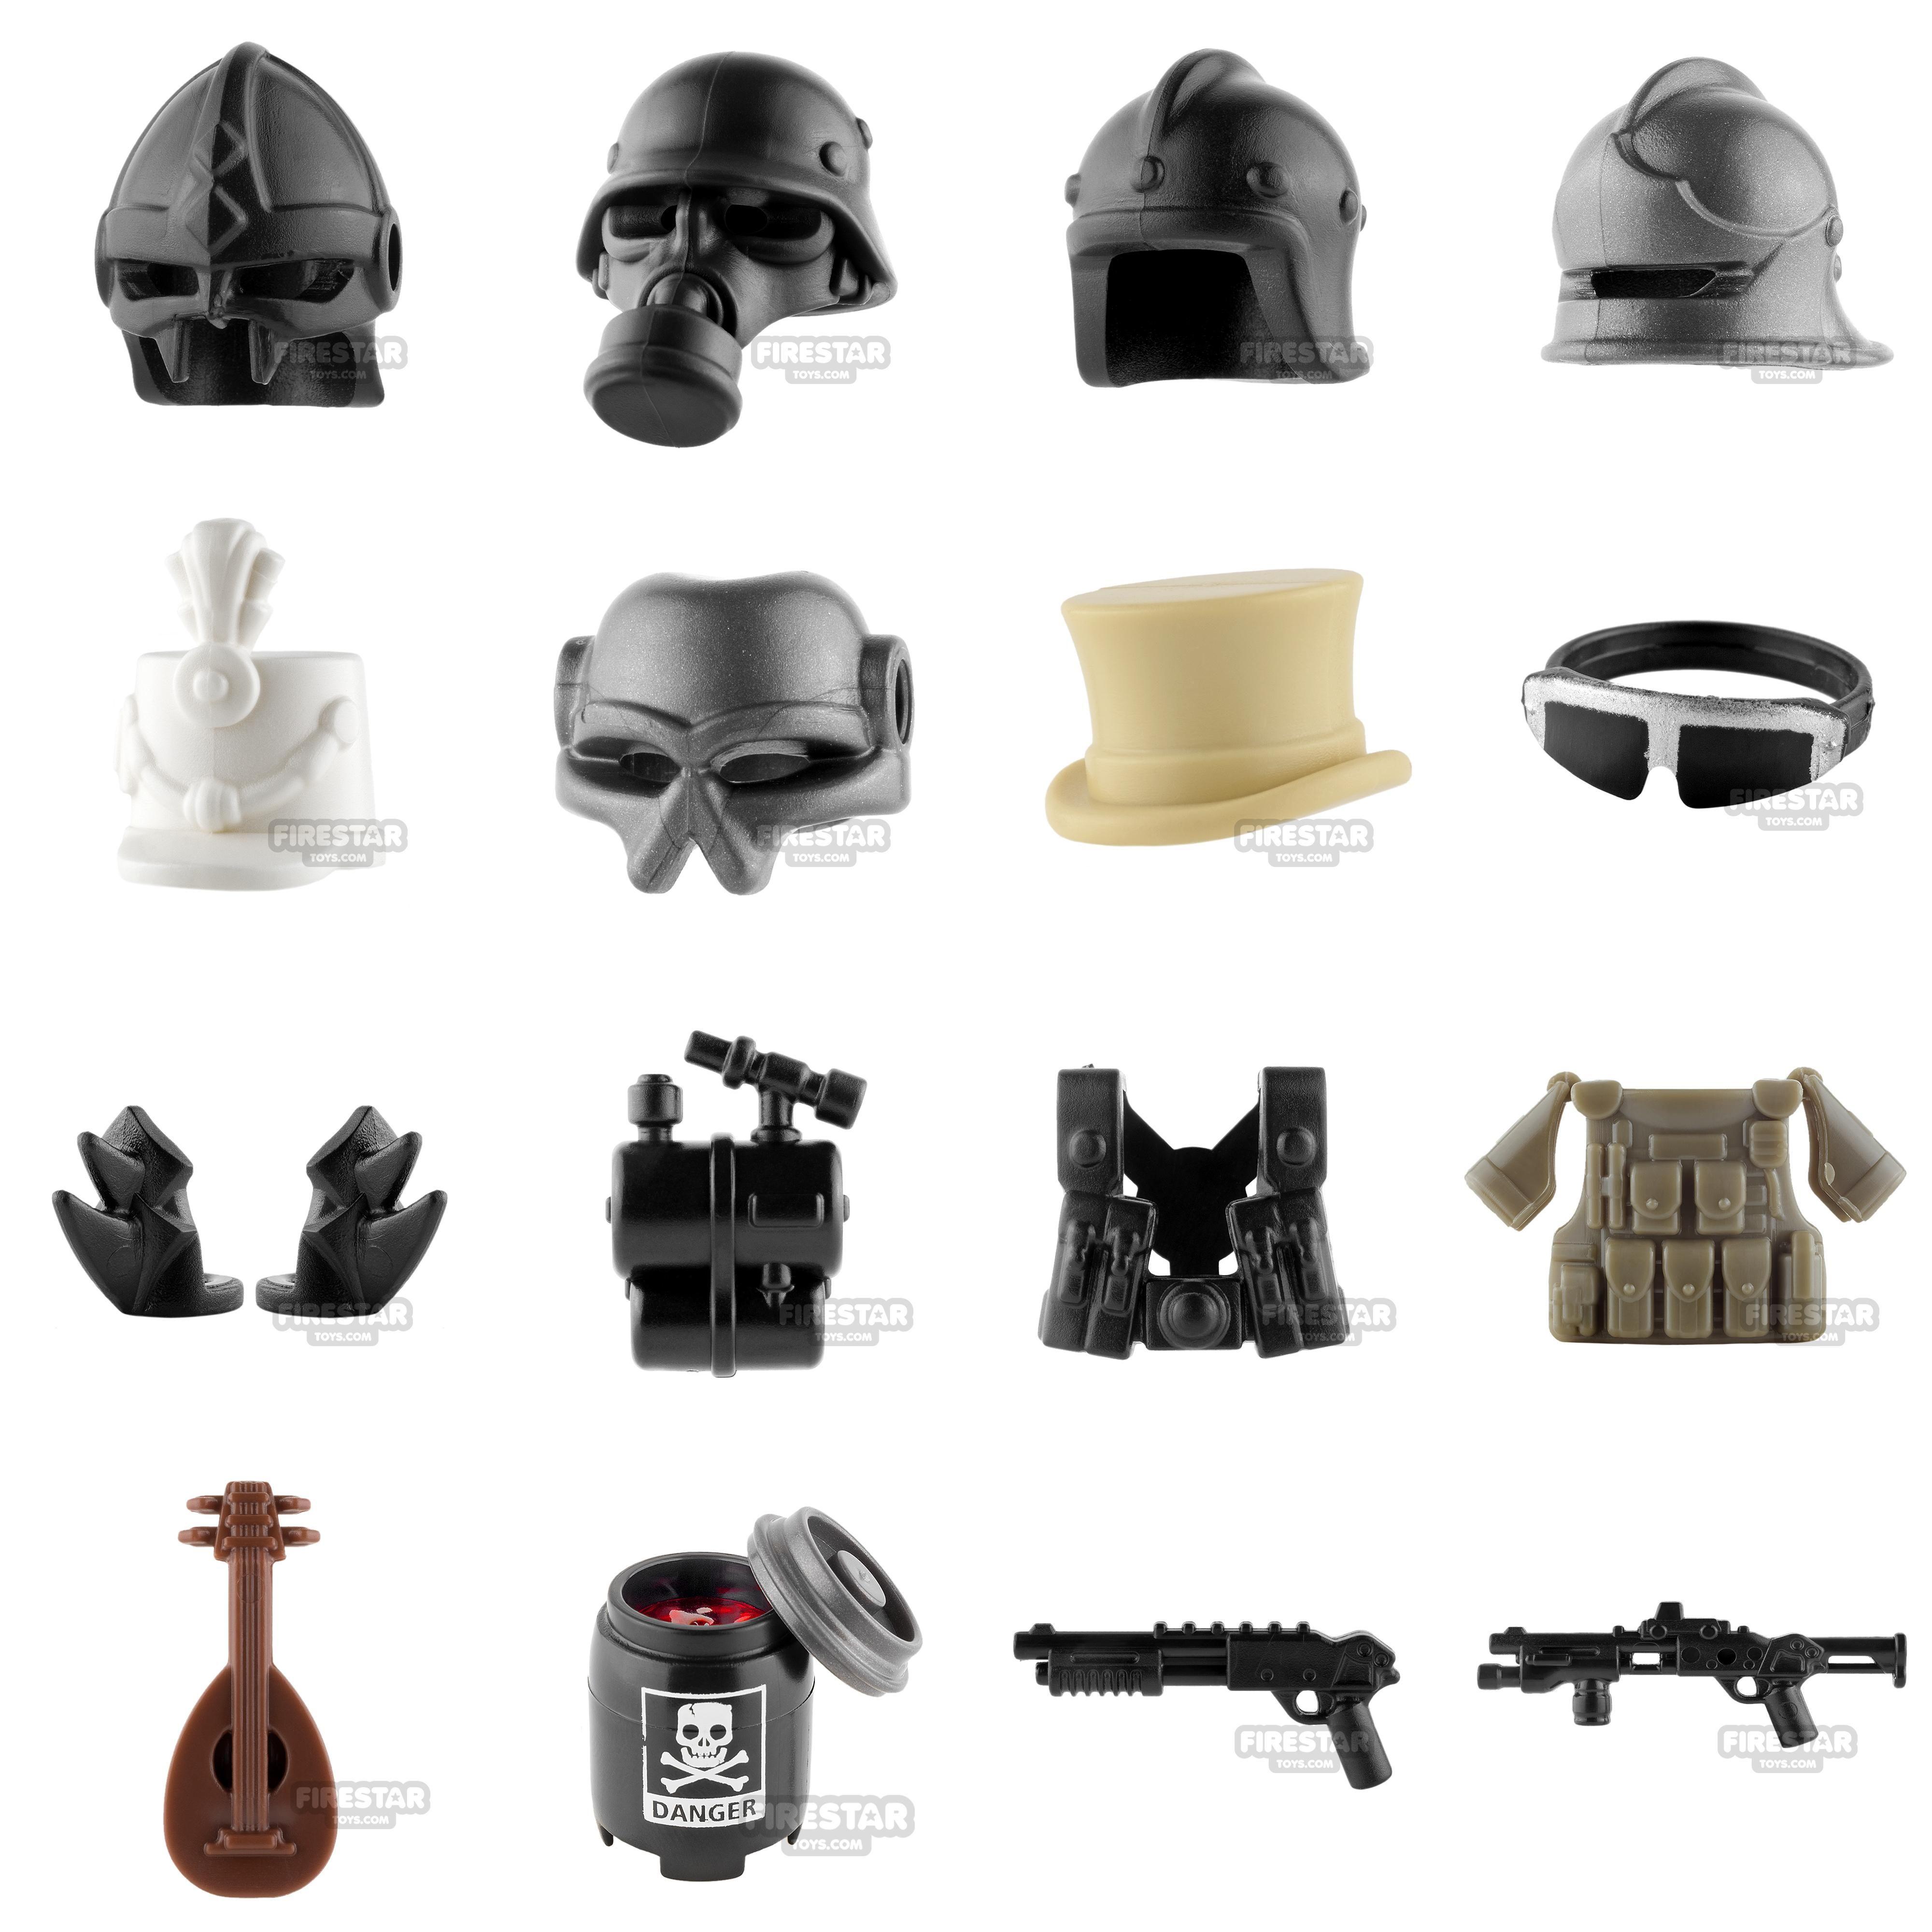 100+ minifigure parts added this week! Some great examples from Si-Dan    Brick Warriors www.firestartoys.com  lego  minifigures  legocustom  moc   legomoc ... 066ef52c7f46